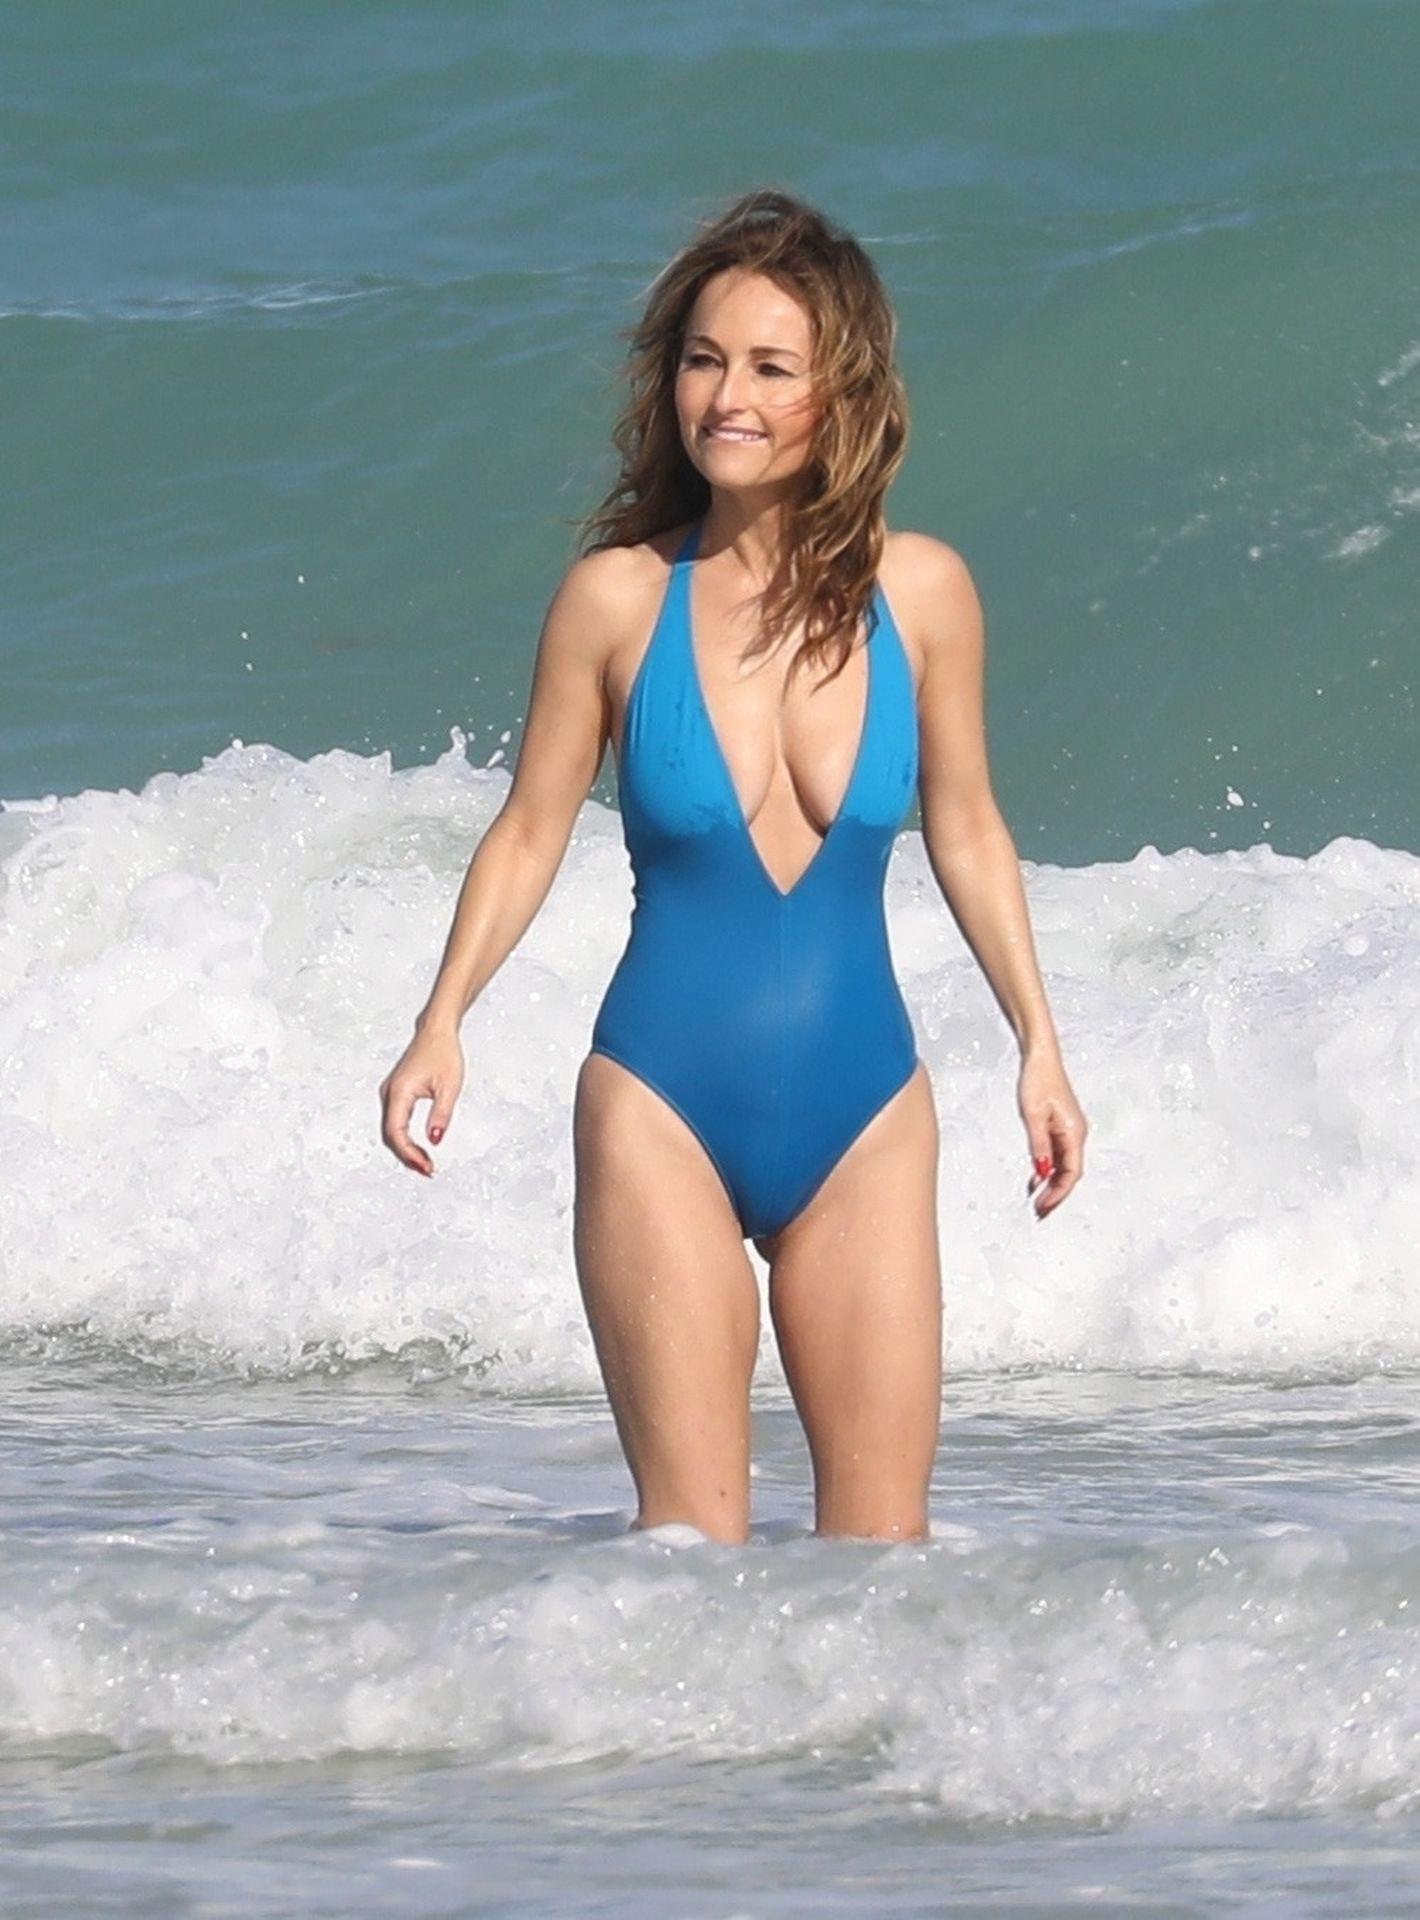 American-Italian Chef Giada De Laurentiis Boobs Slip & Swimsuit Photos - Thefappening.link